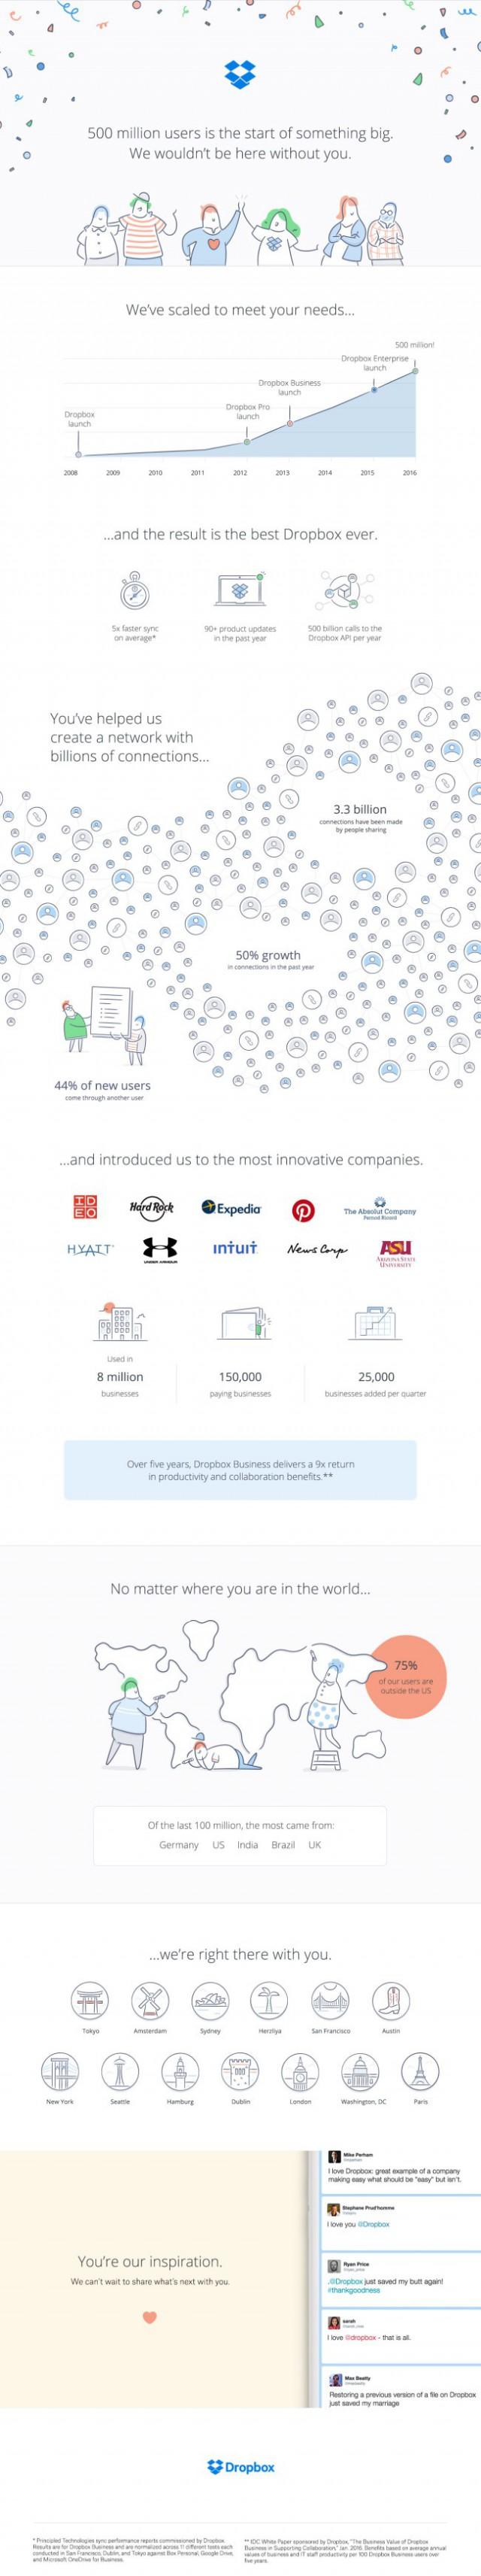 dropbox-500-million-infographic1